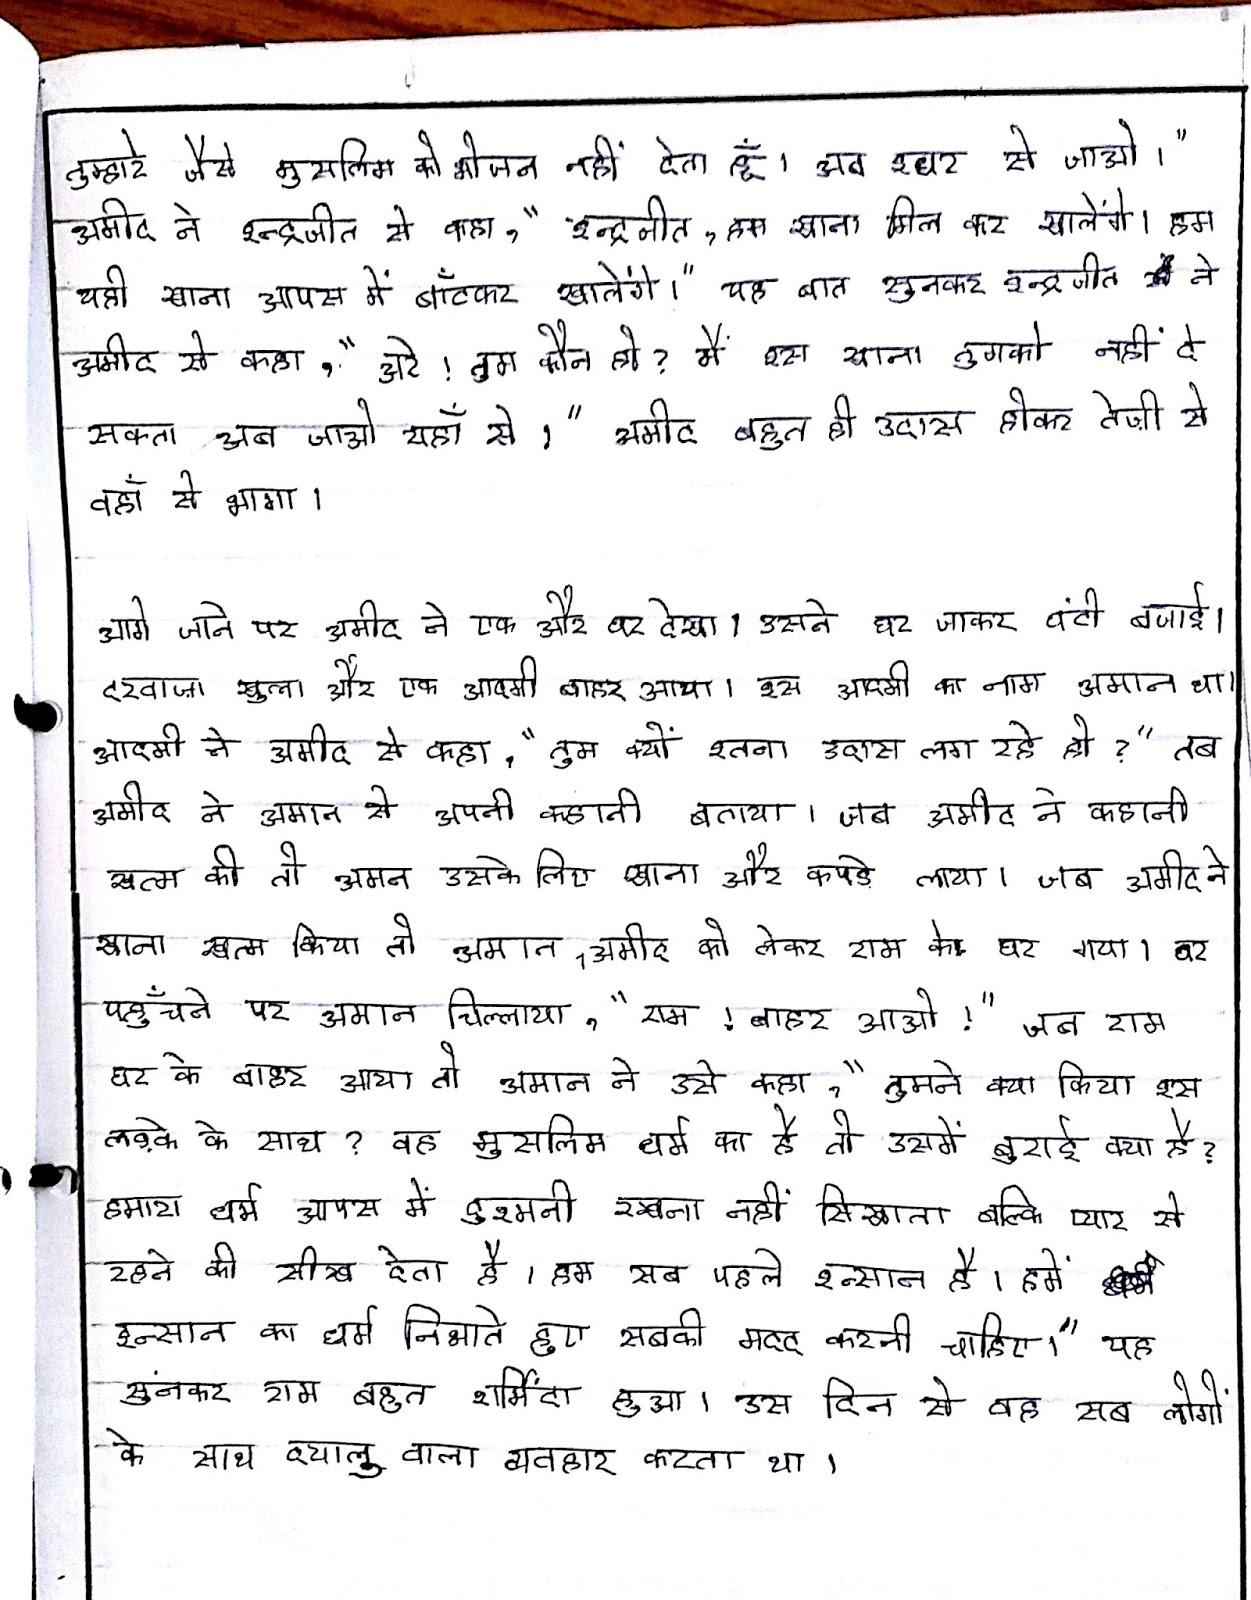 Newspaper analysis essay